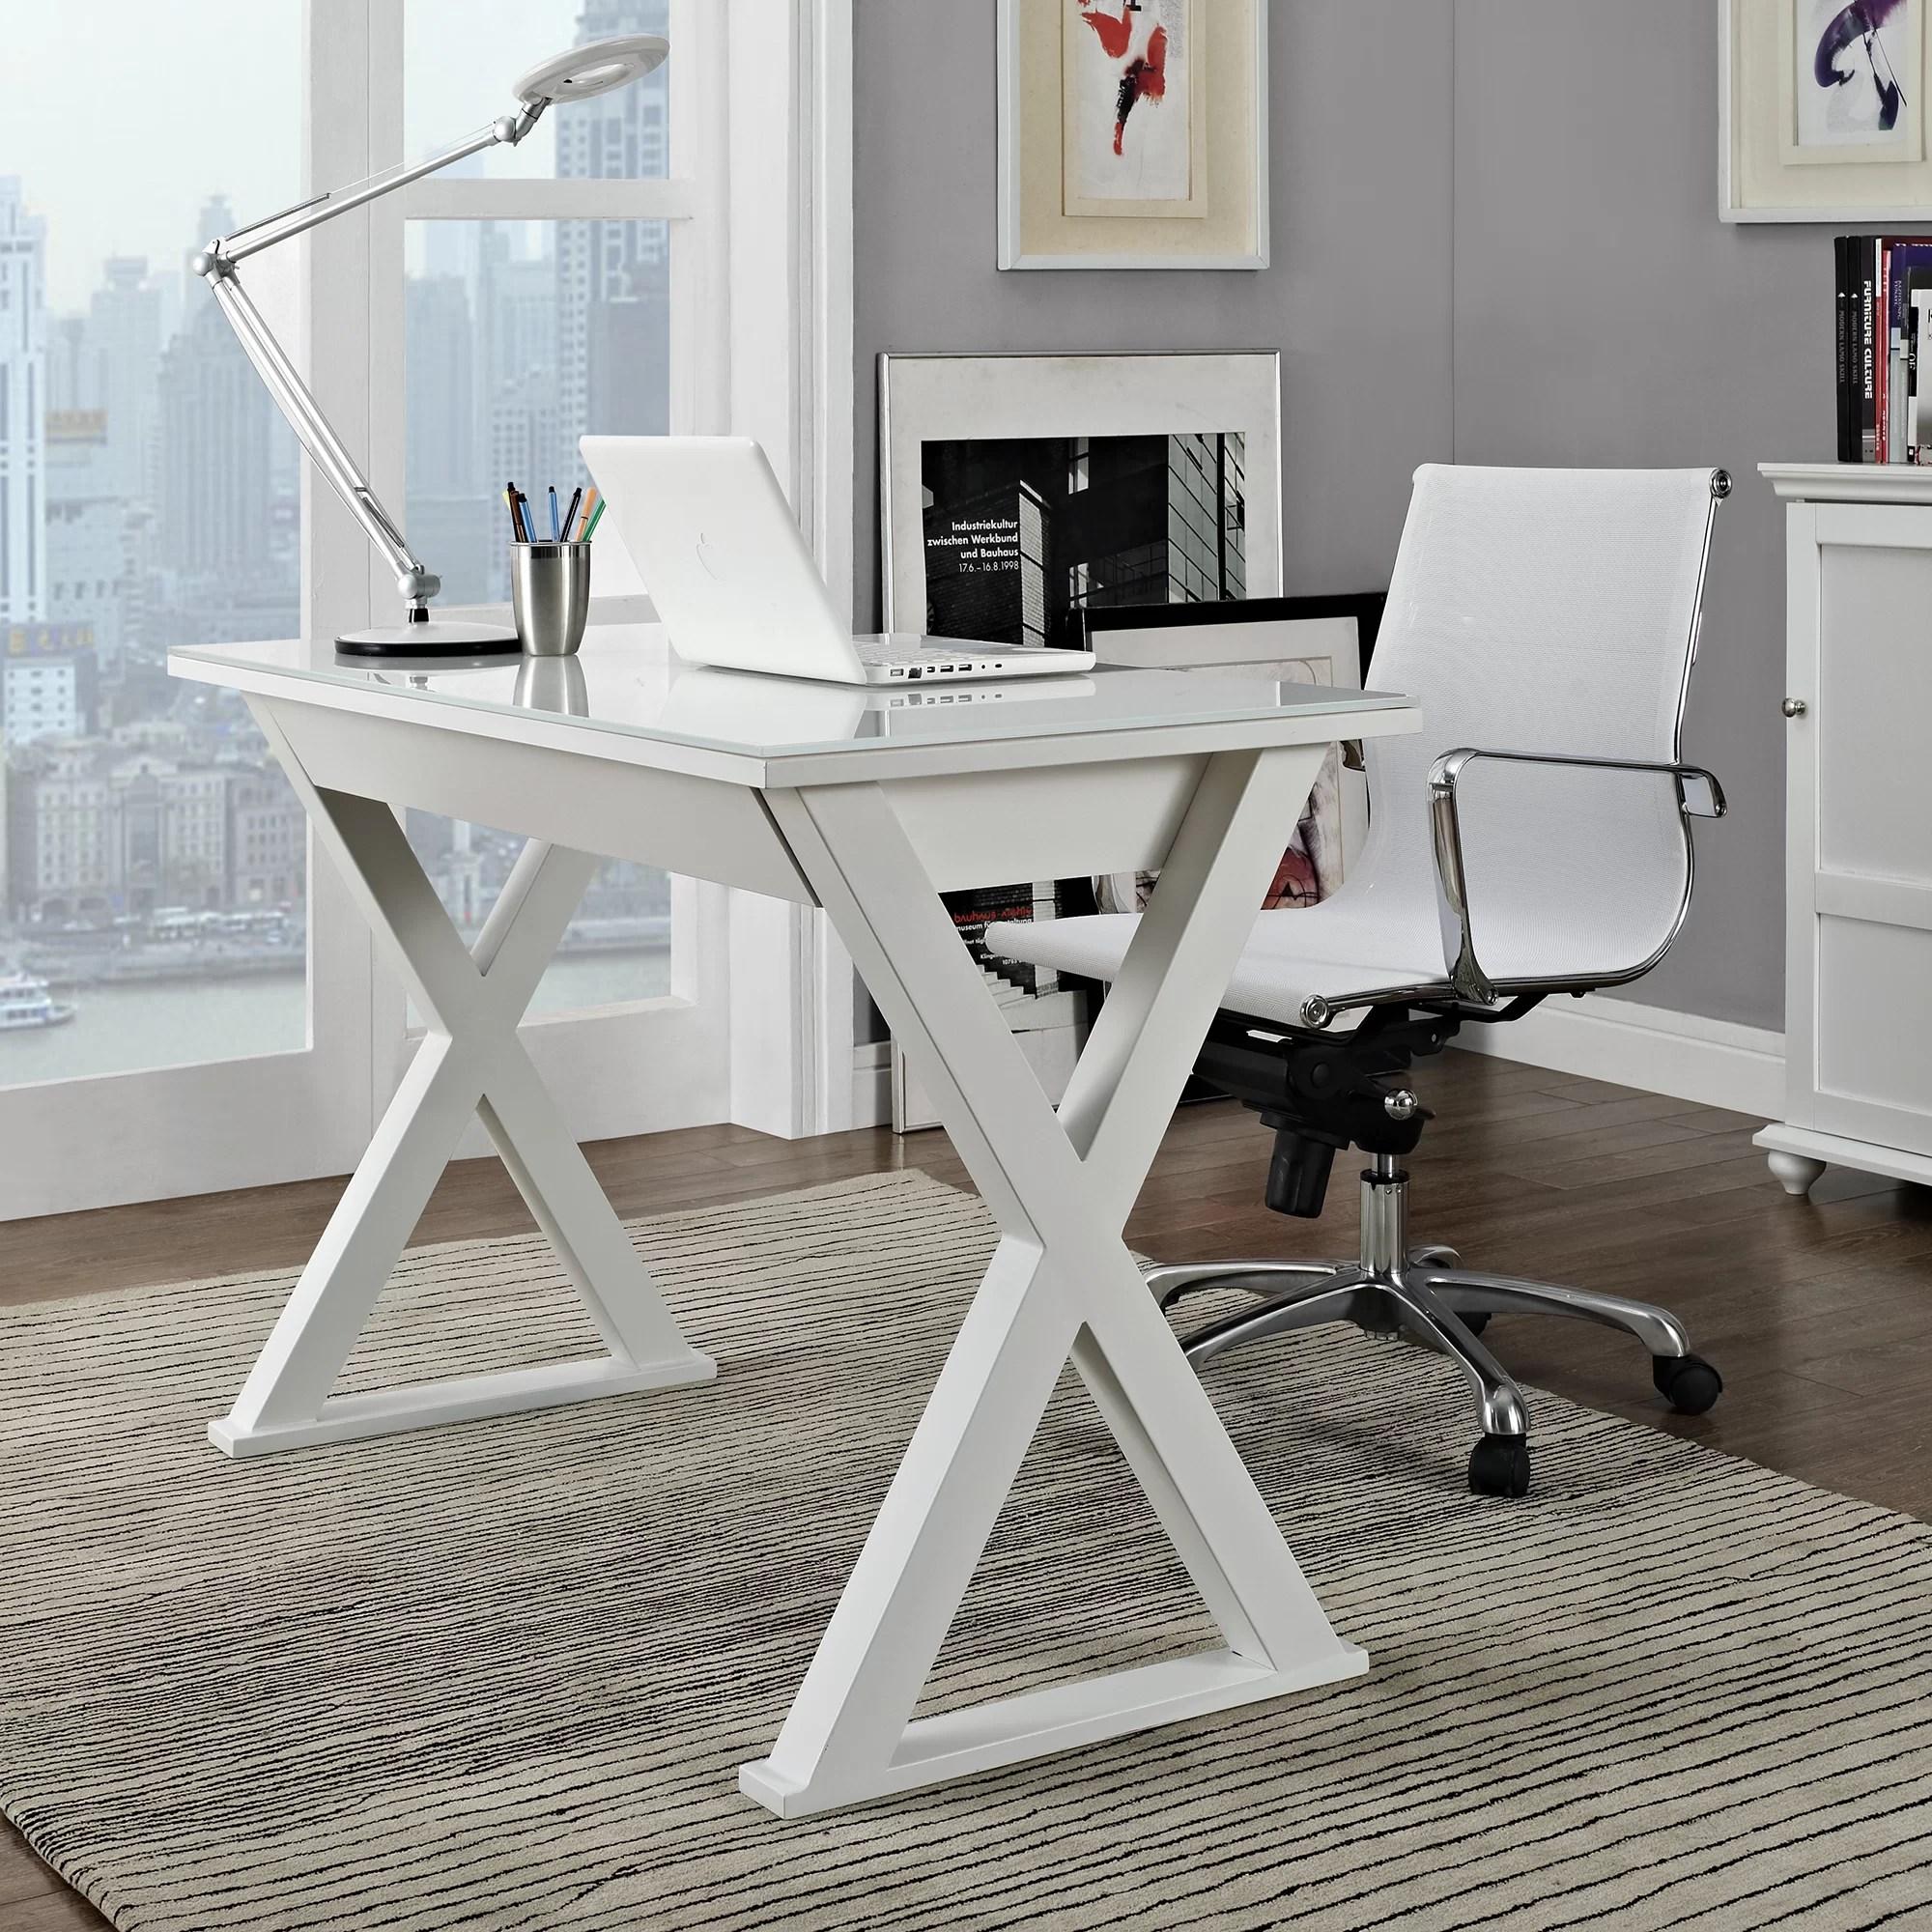 wayfair desk chairs ergonomic chair godrej latitude run montclair executive writing & reviews  